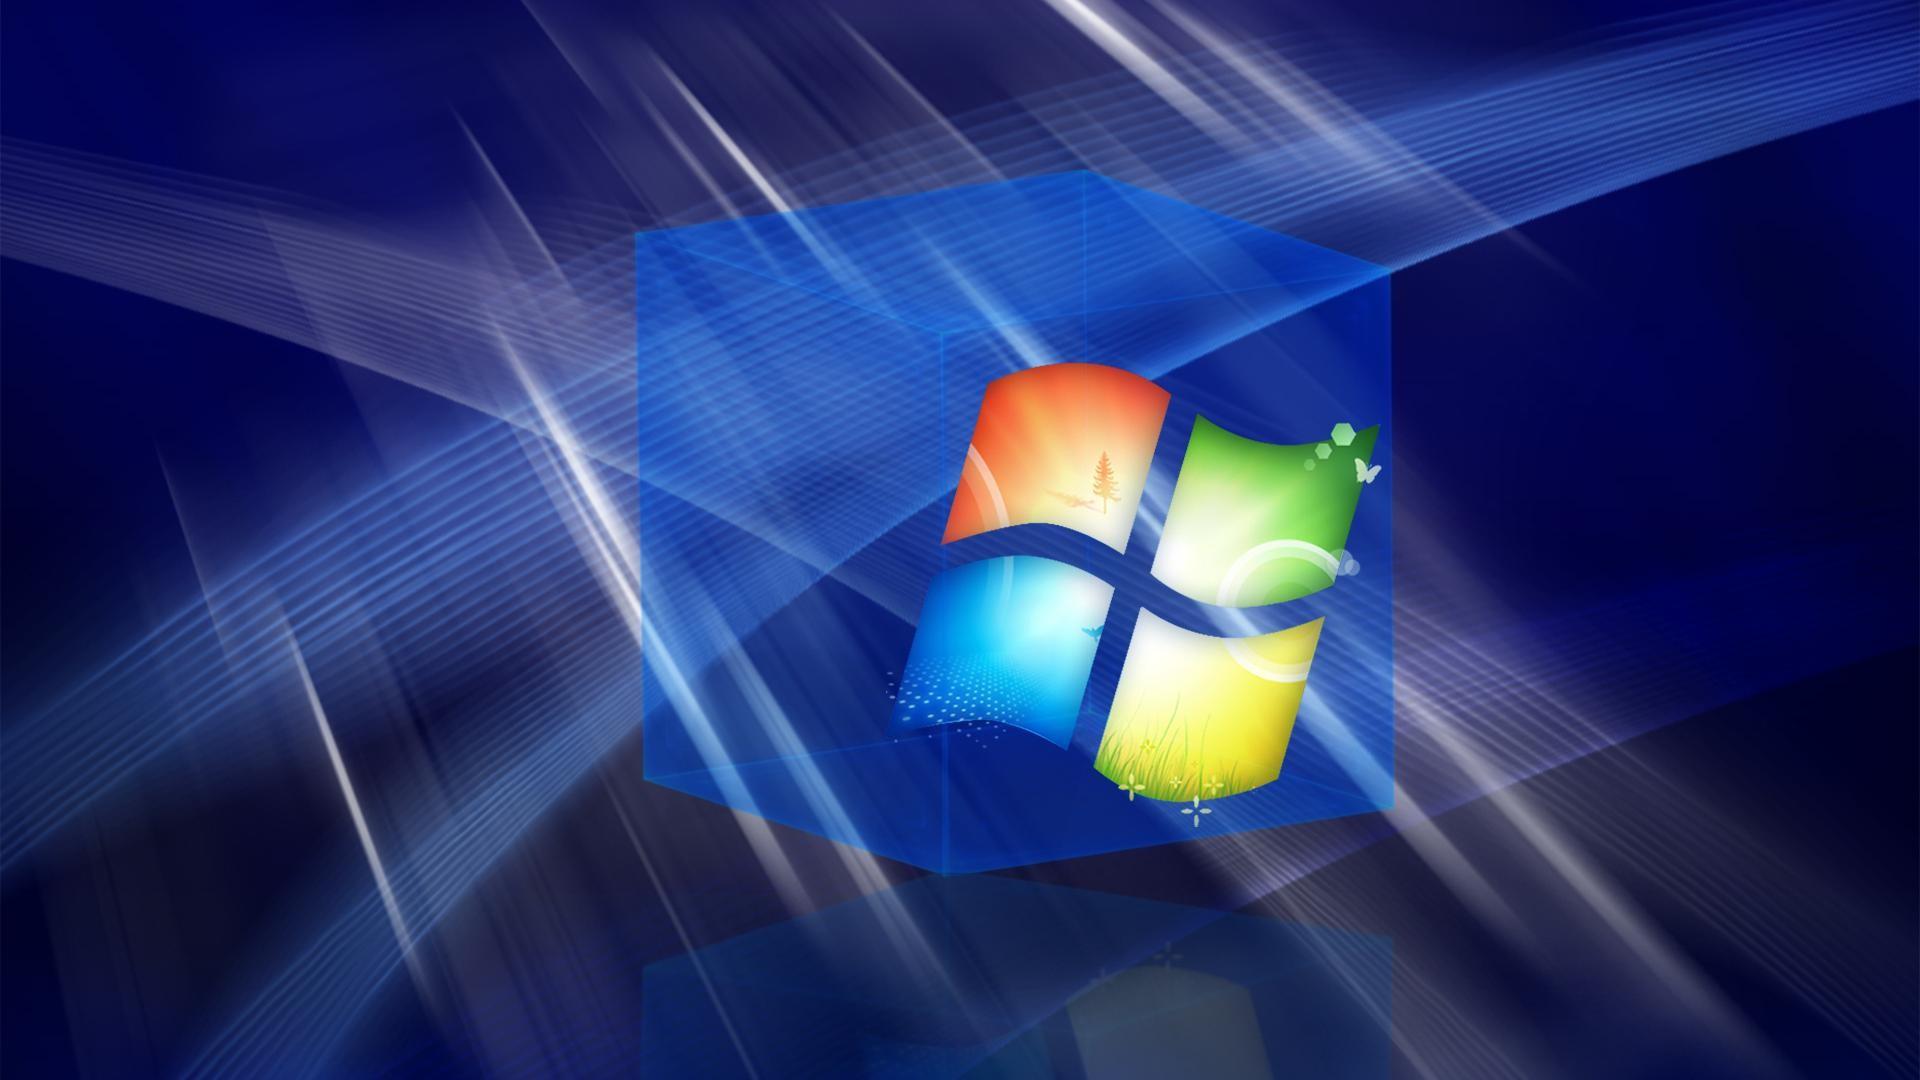 Hd 3d Blue Windows Cube desktop backgrounds wide wallpapers :1280×800,1440×900,1680×1050